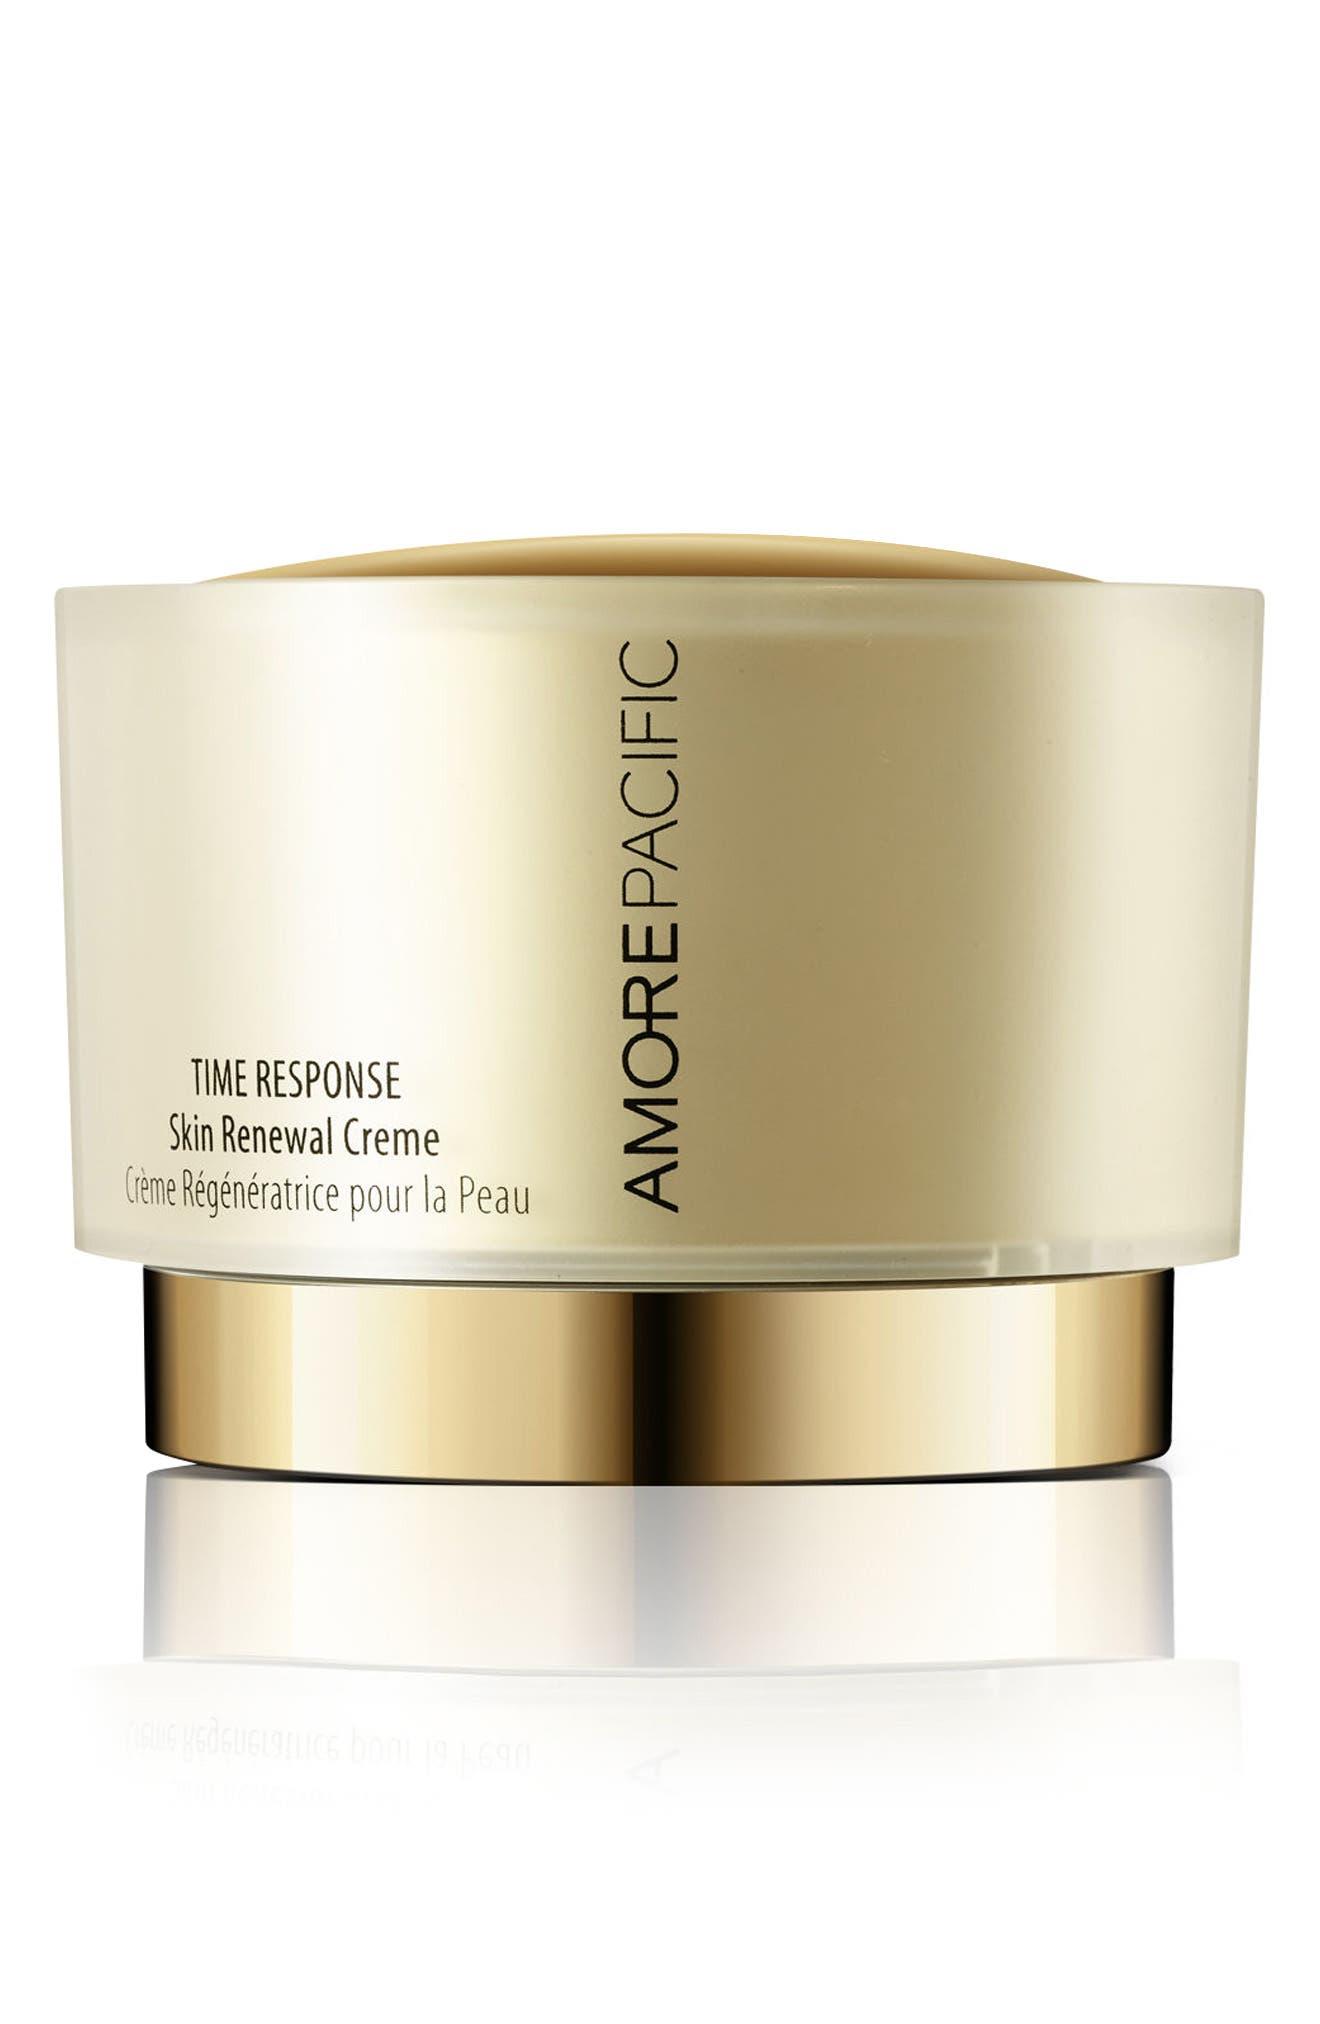 Time Response Skin Renewal Crème,                             Main thumbnail 1, color,                             000